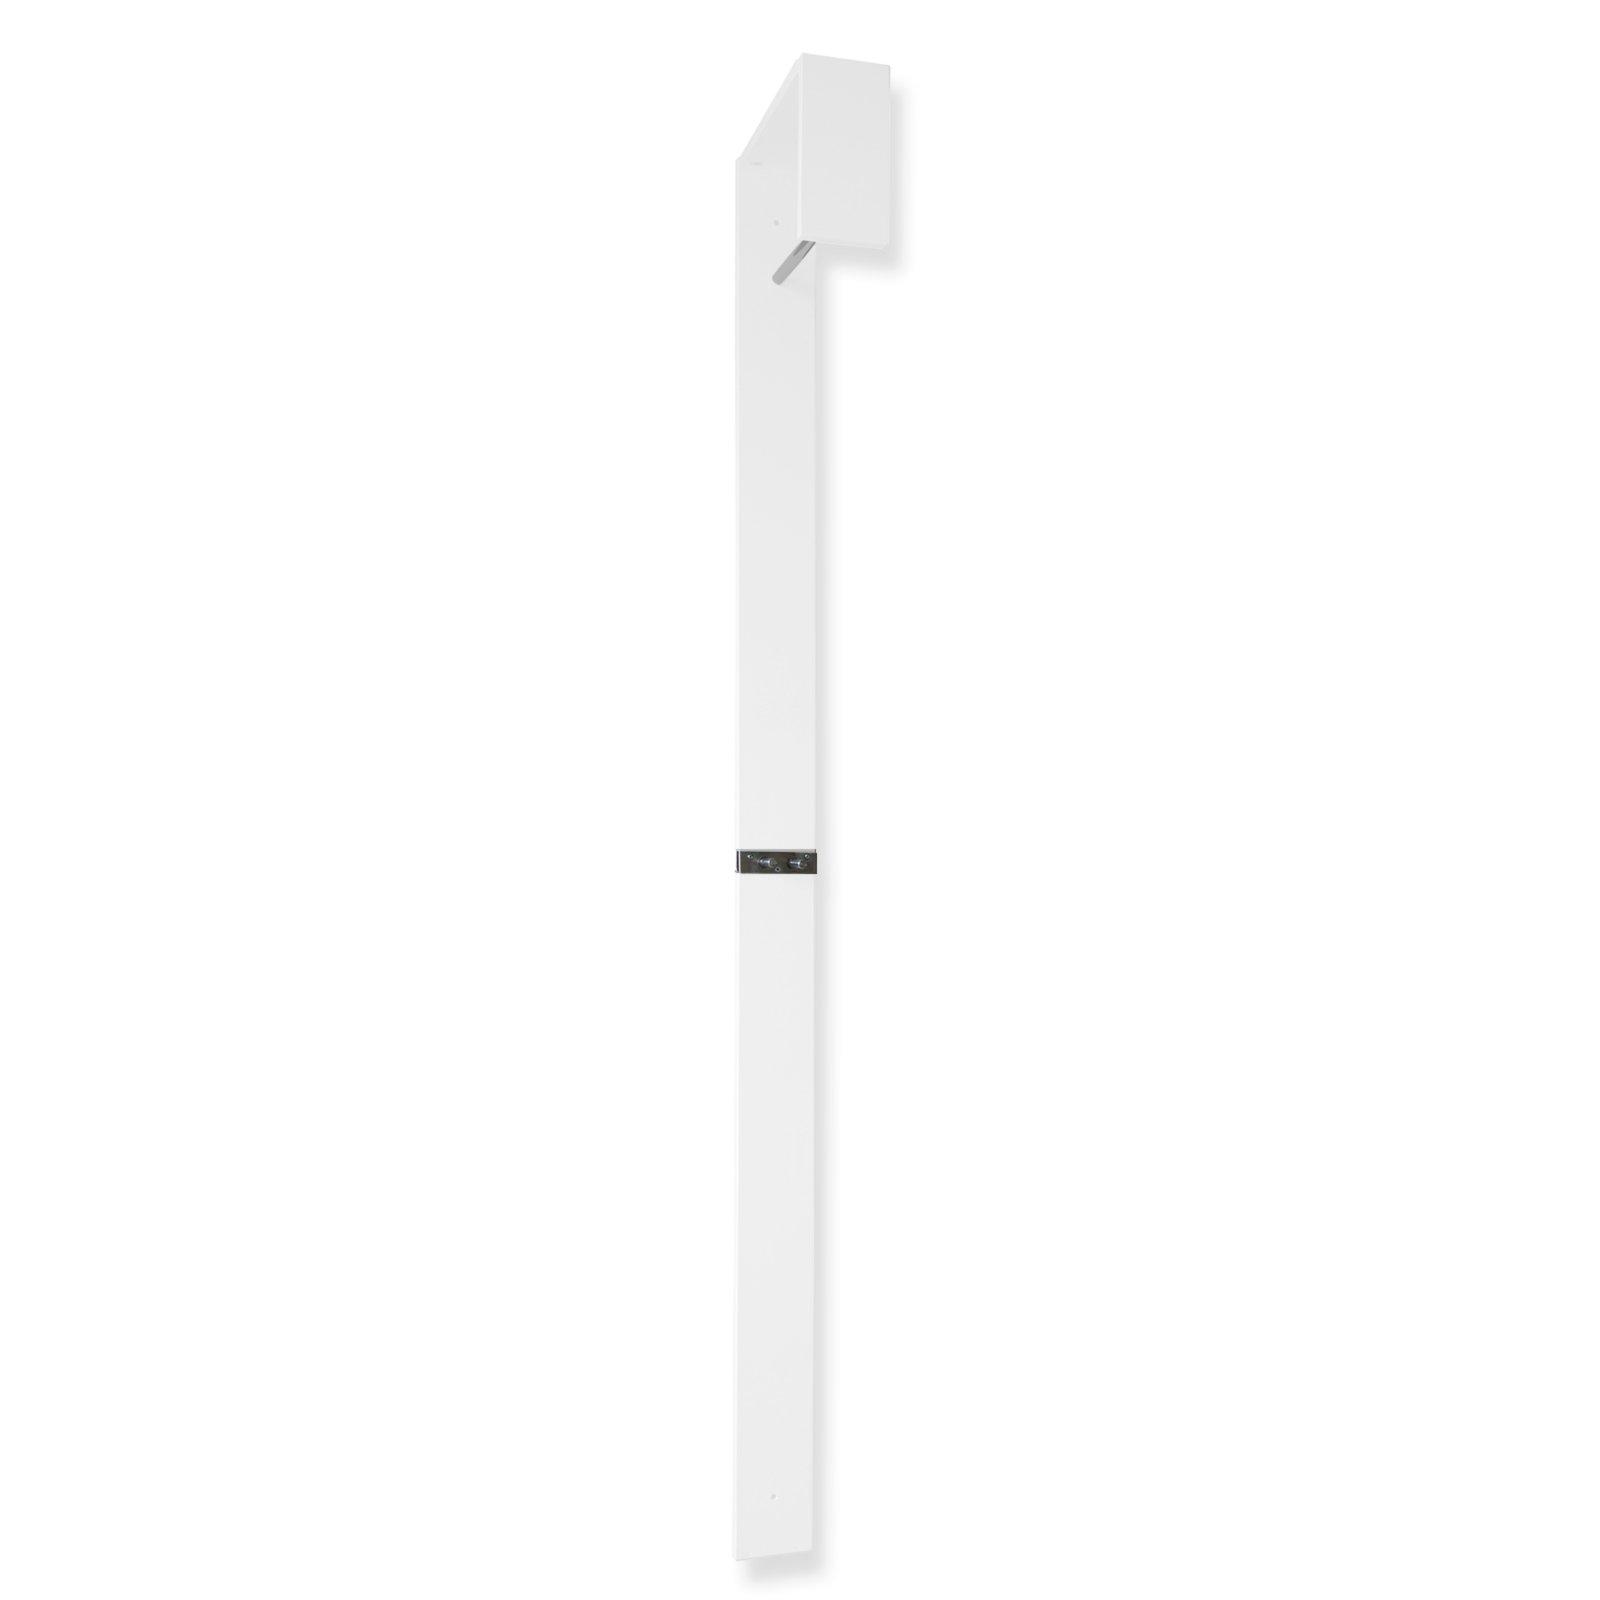 wandgarderobe wei hochglanz 10x180 cm wandgarderoben paneele flur diele. Black Bedroom Furniture Sets. Home Design Ideas